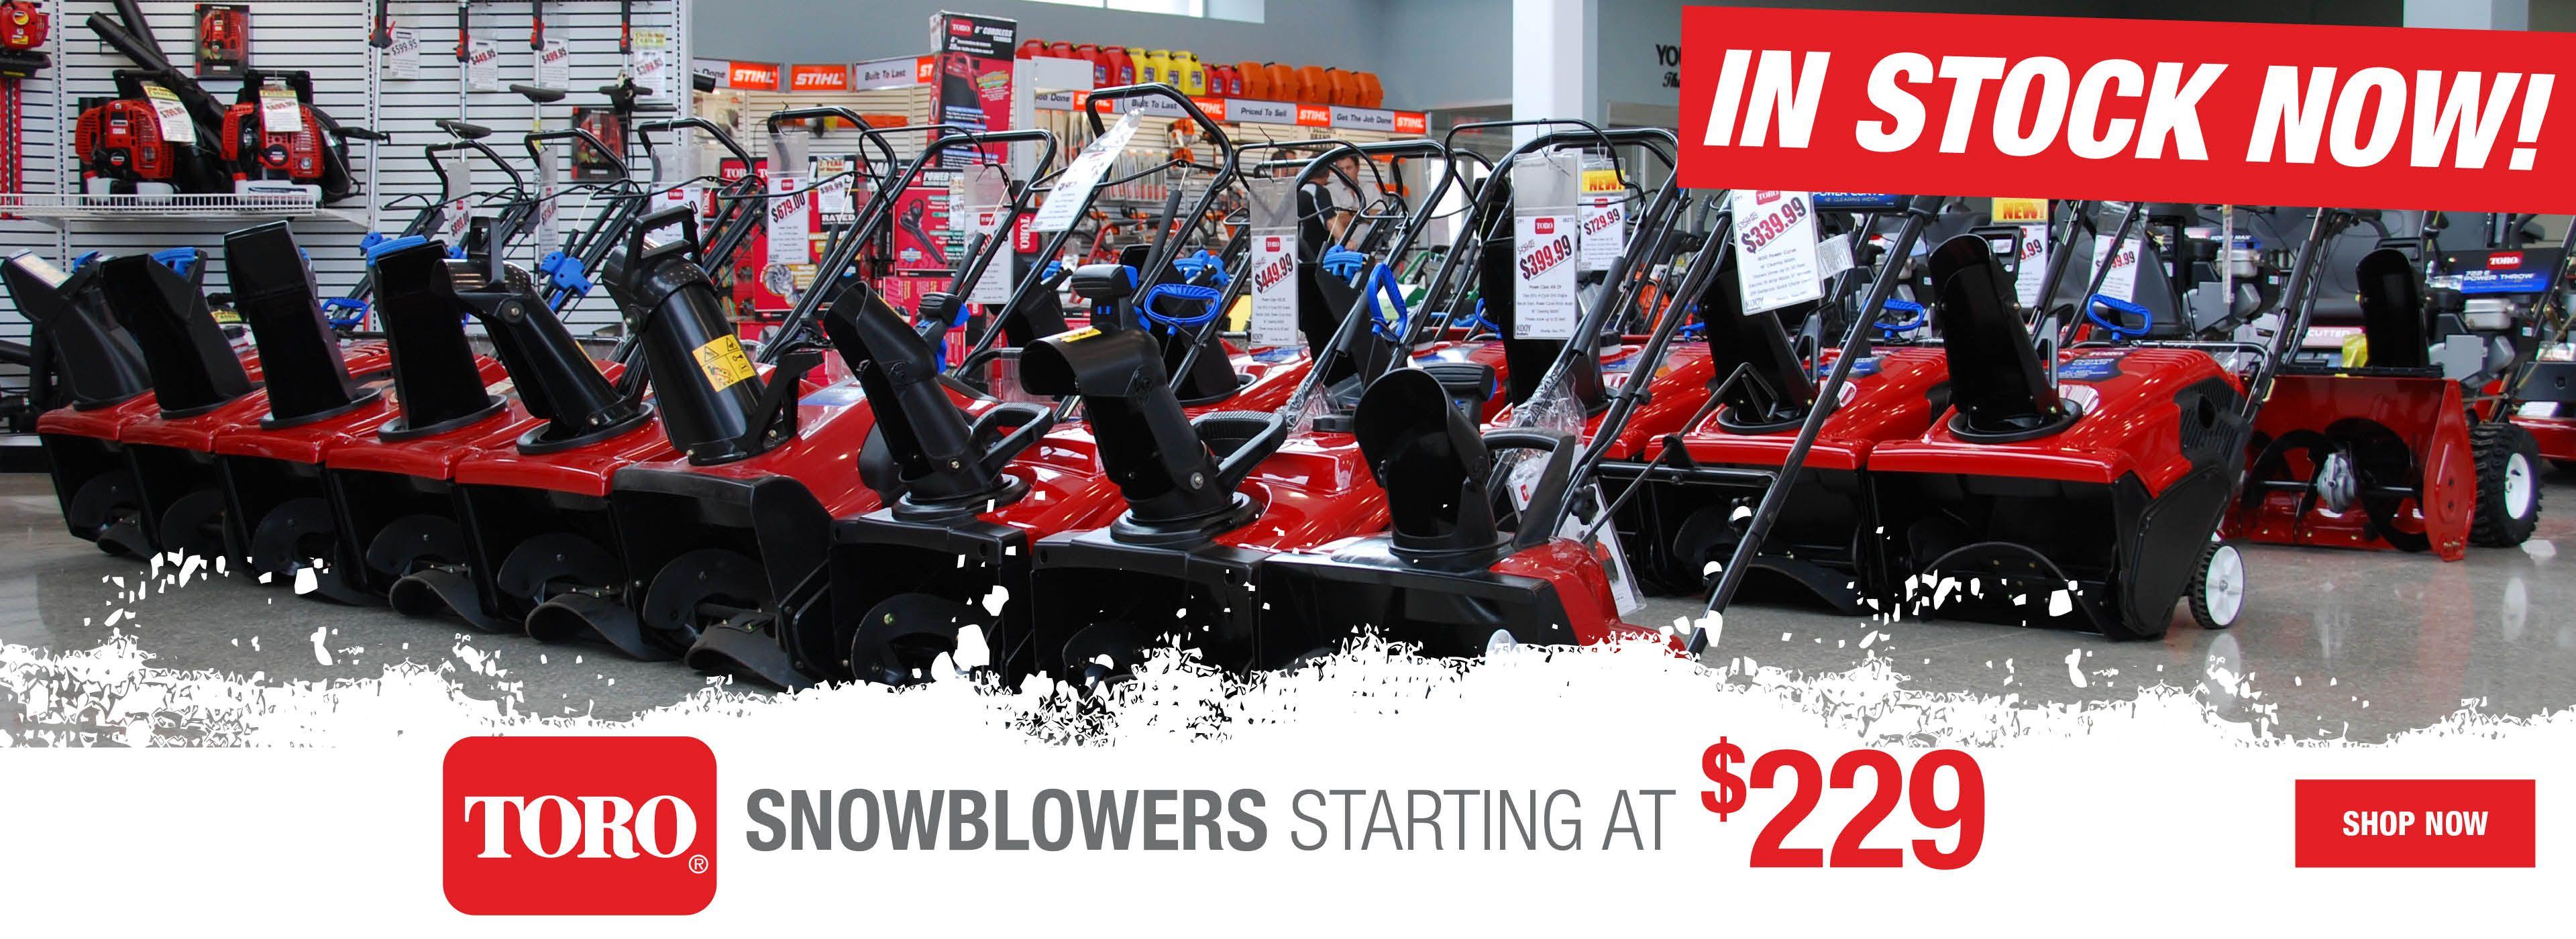 Toro Snowblowers Starting at $229! In Stock NOW!